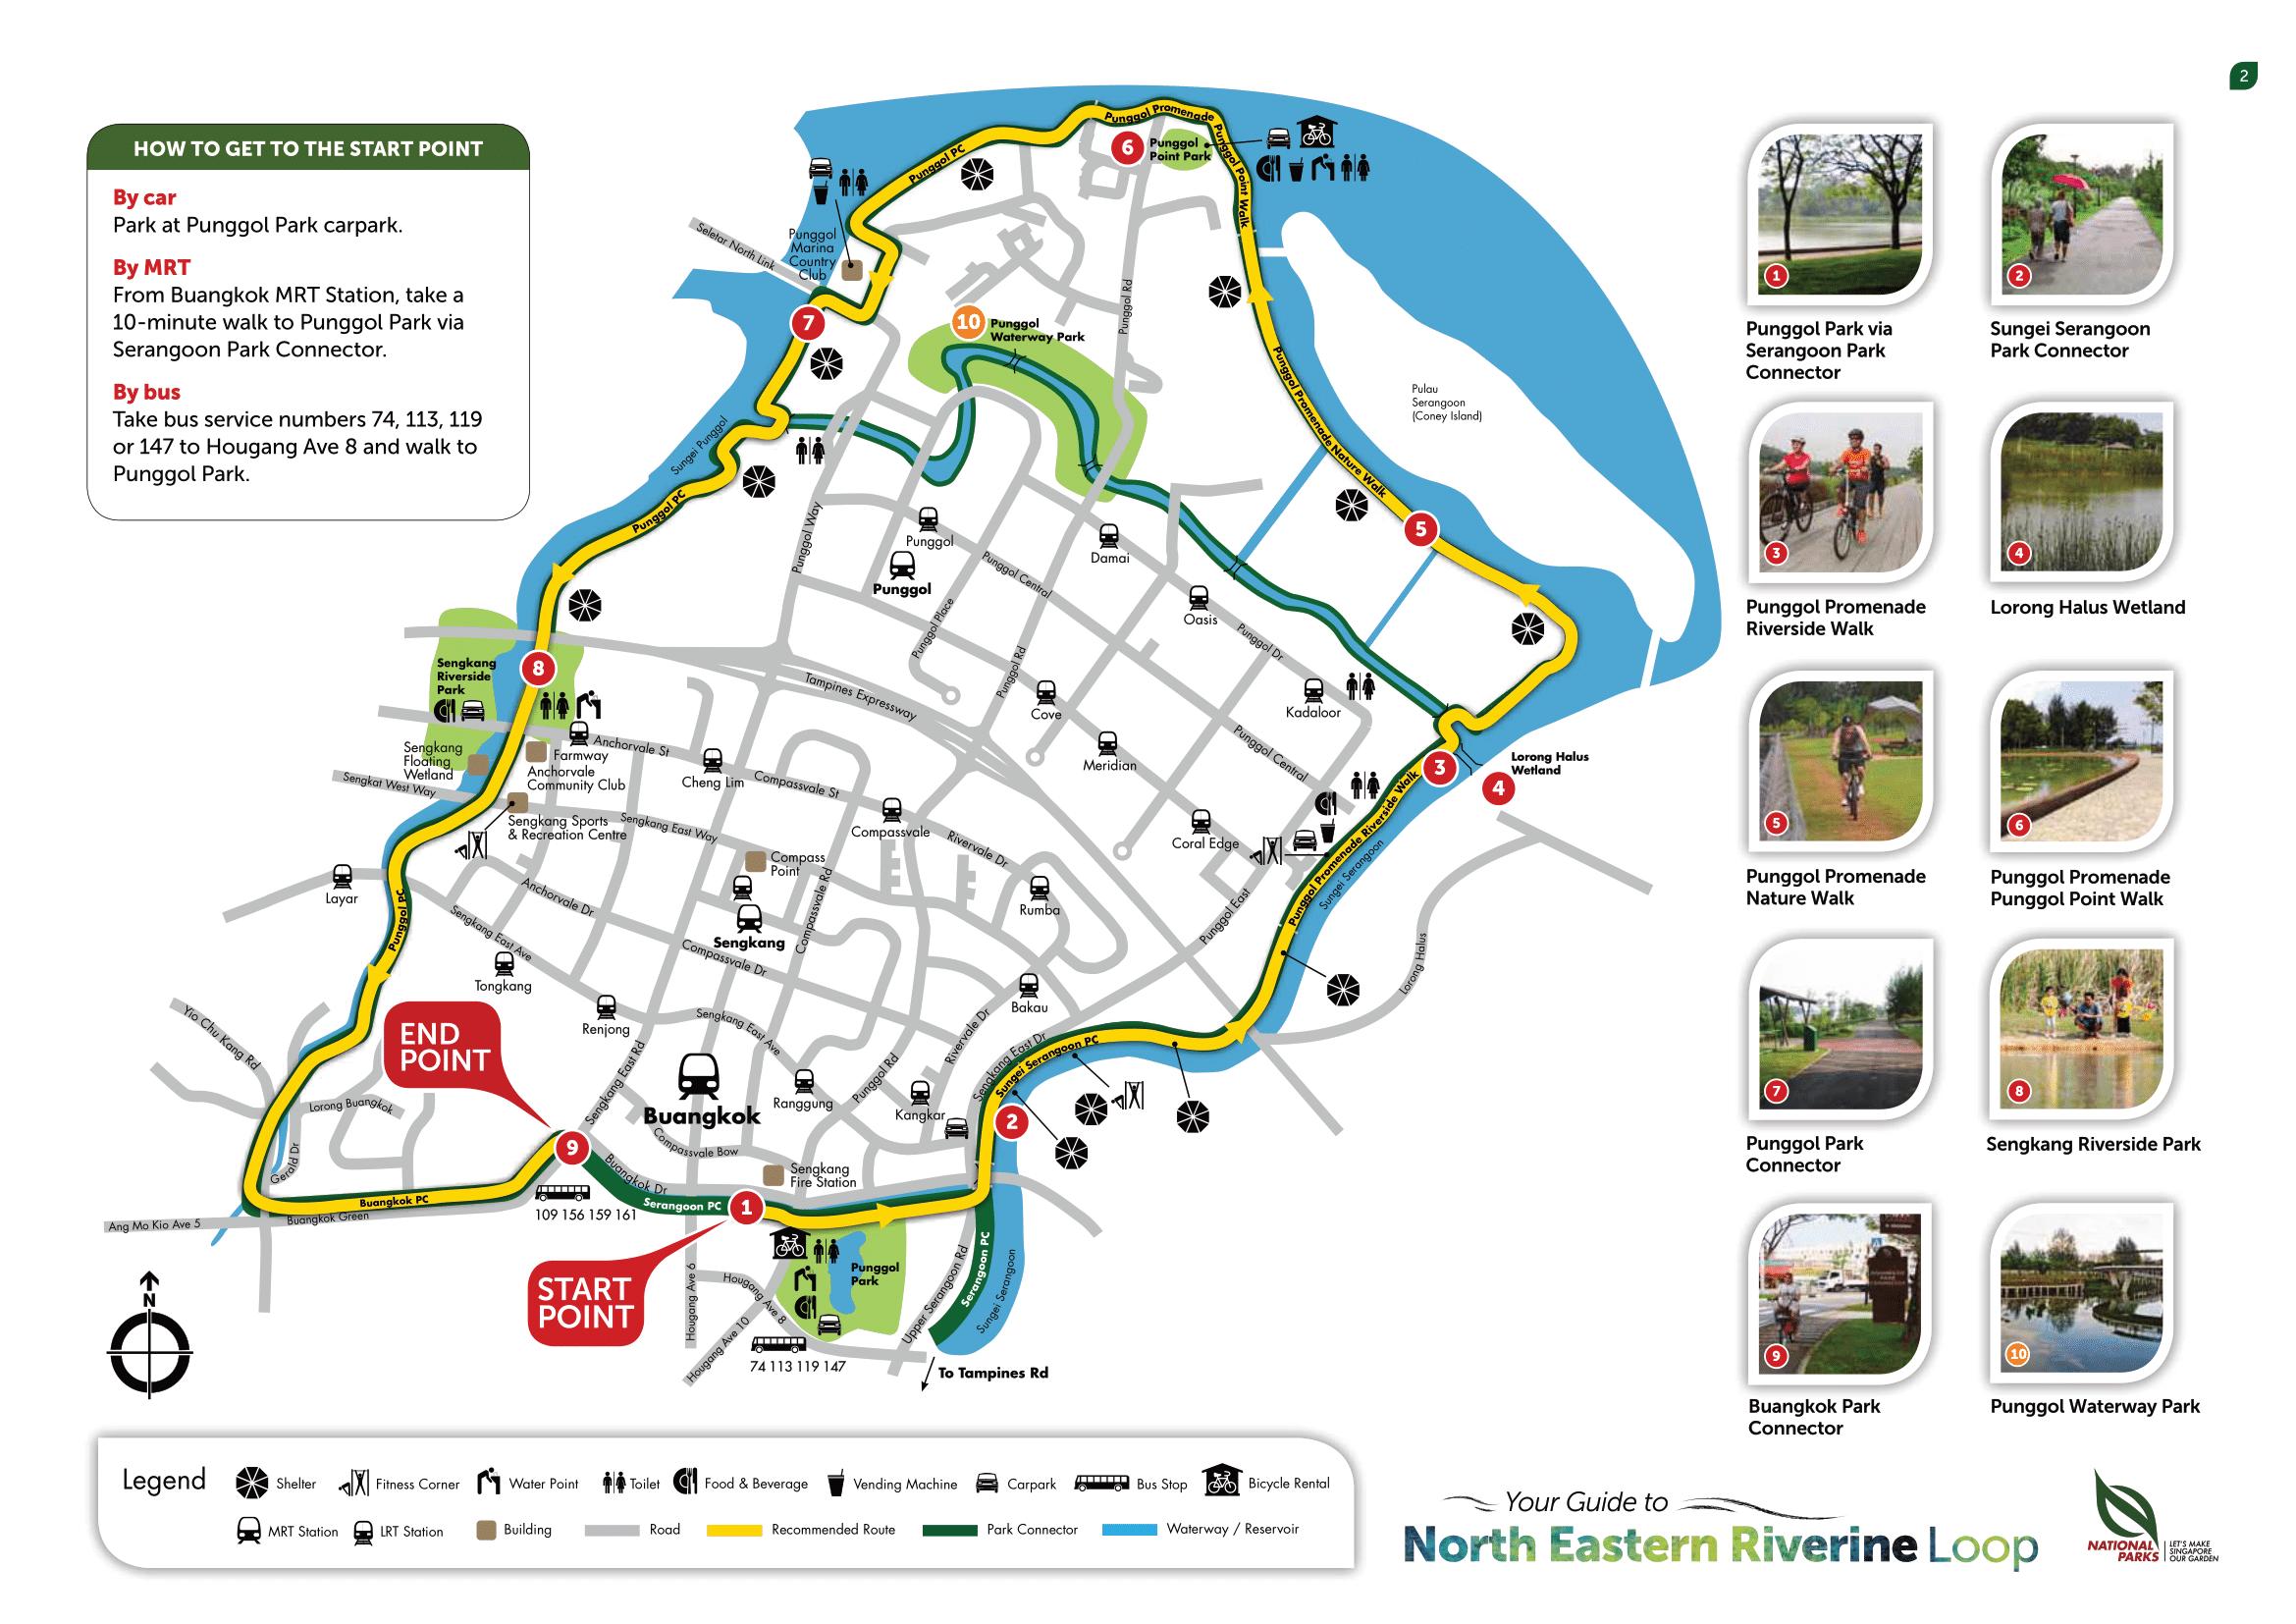 Map of Singapore North East Riverine Loop